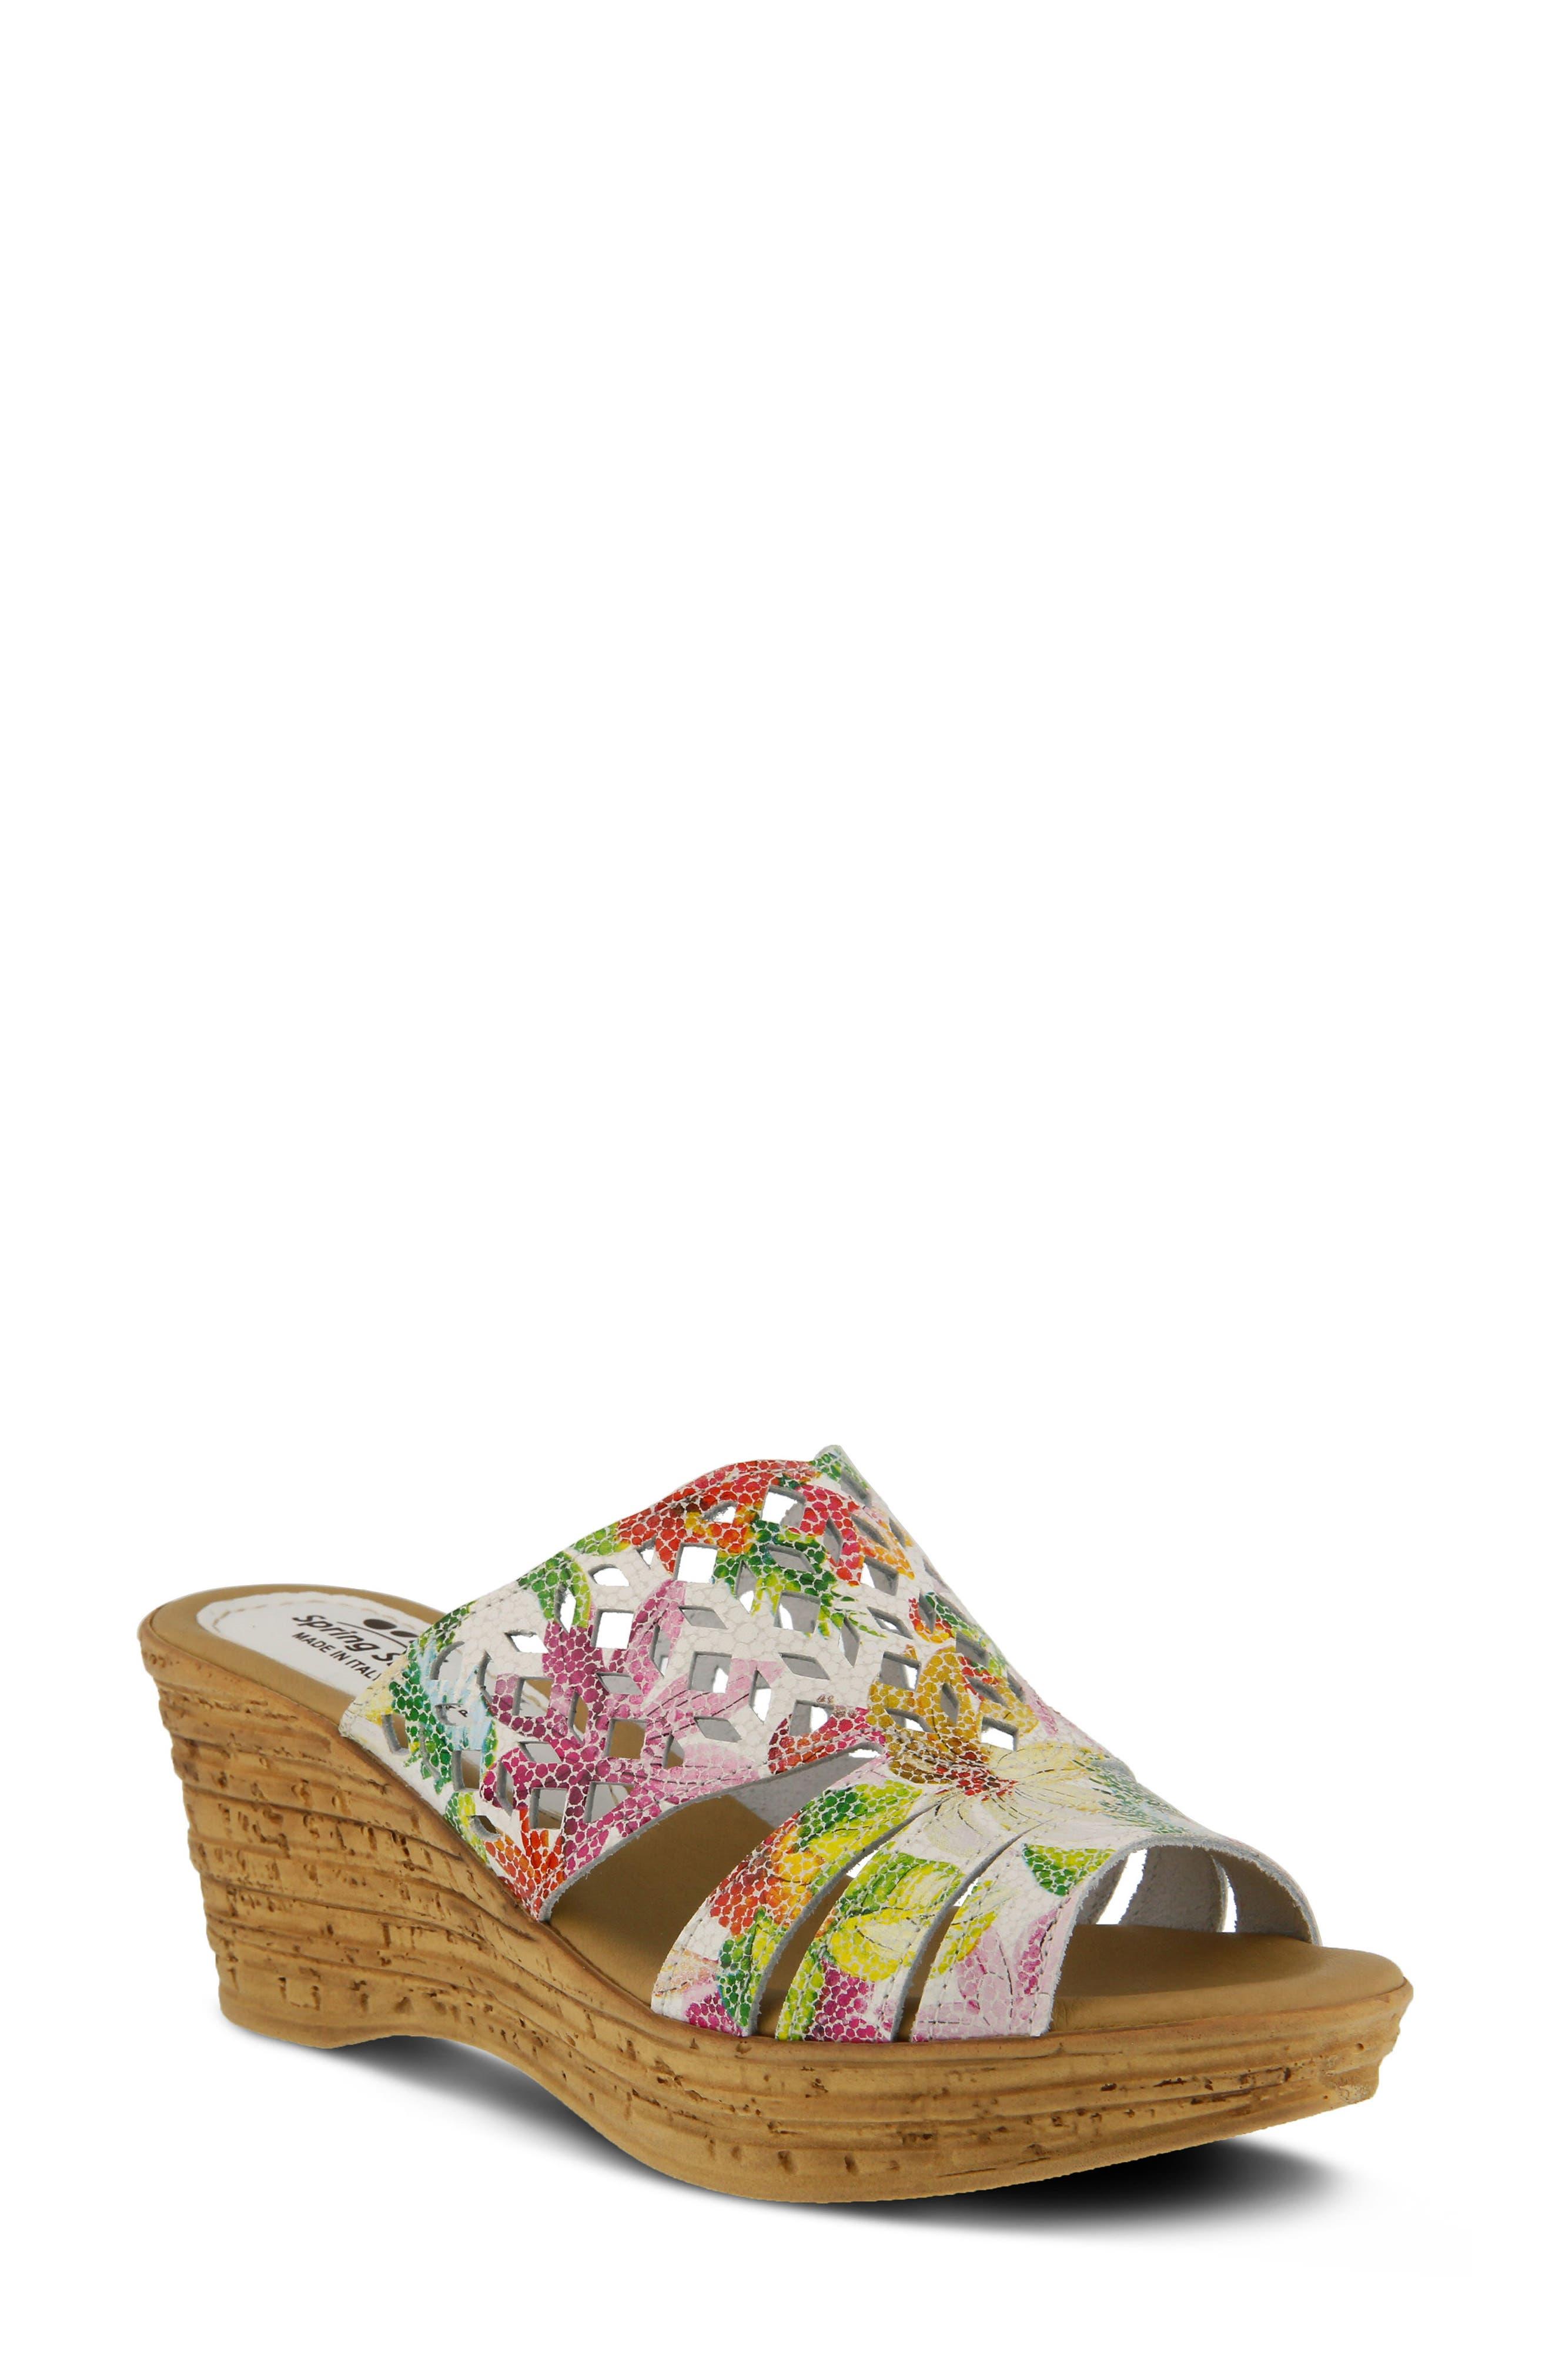 Viniko Platform Wedge Sandal,                         Main,                         color, White Leather